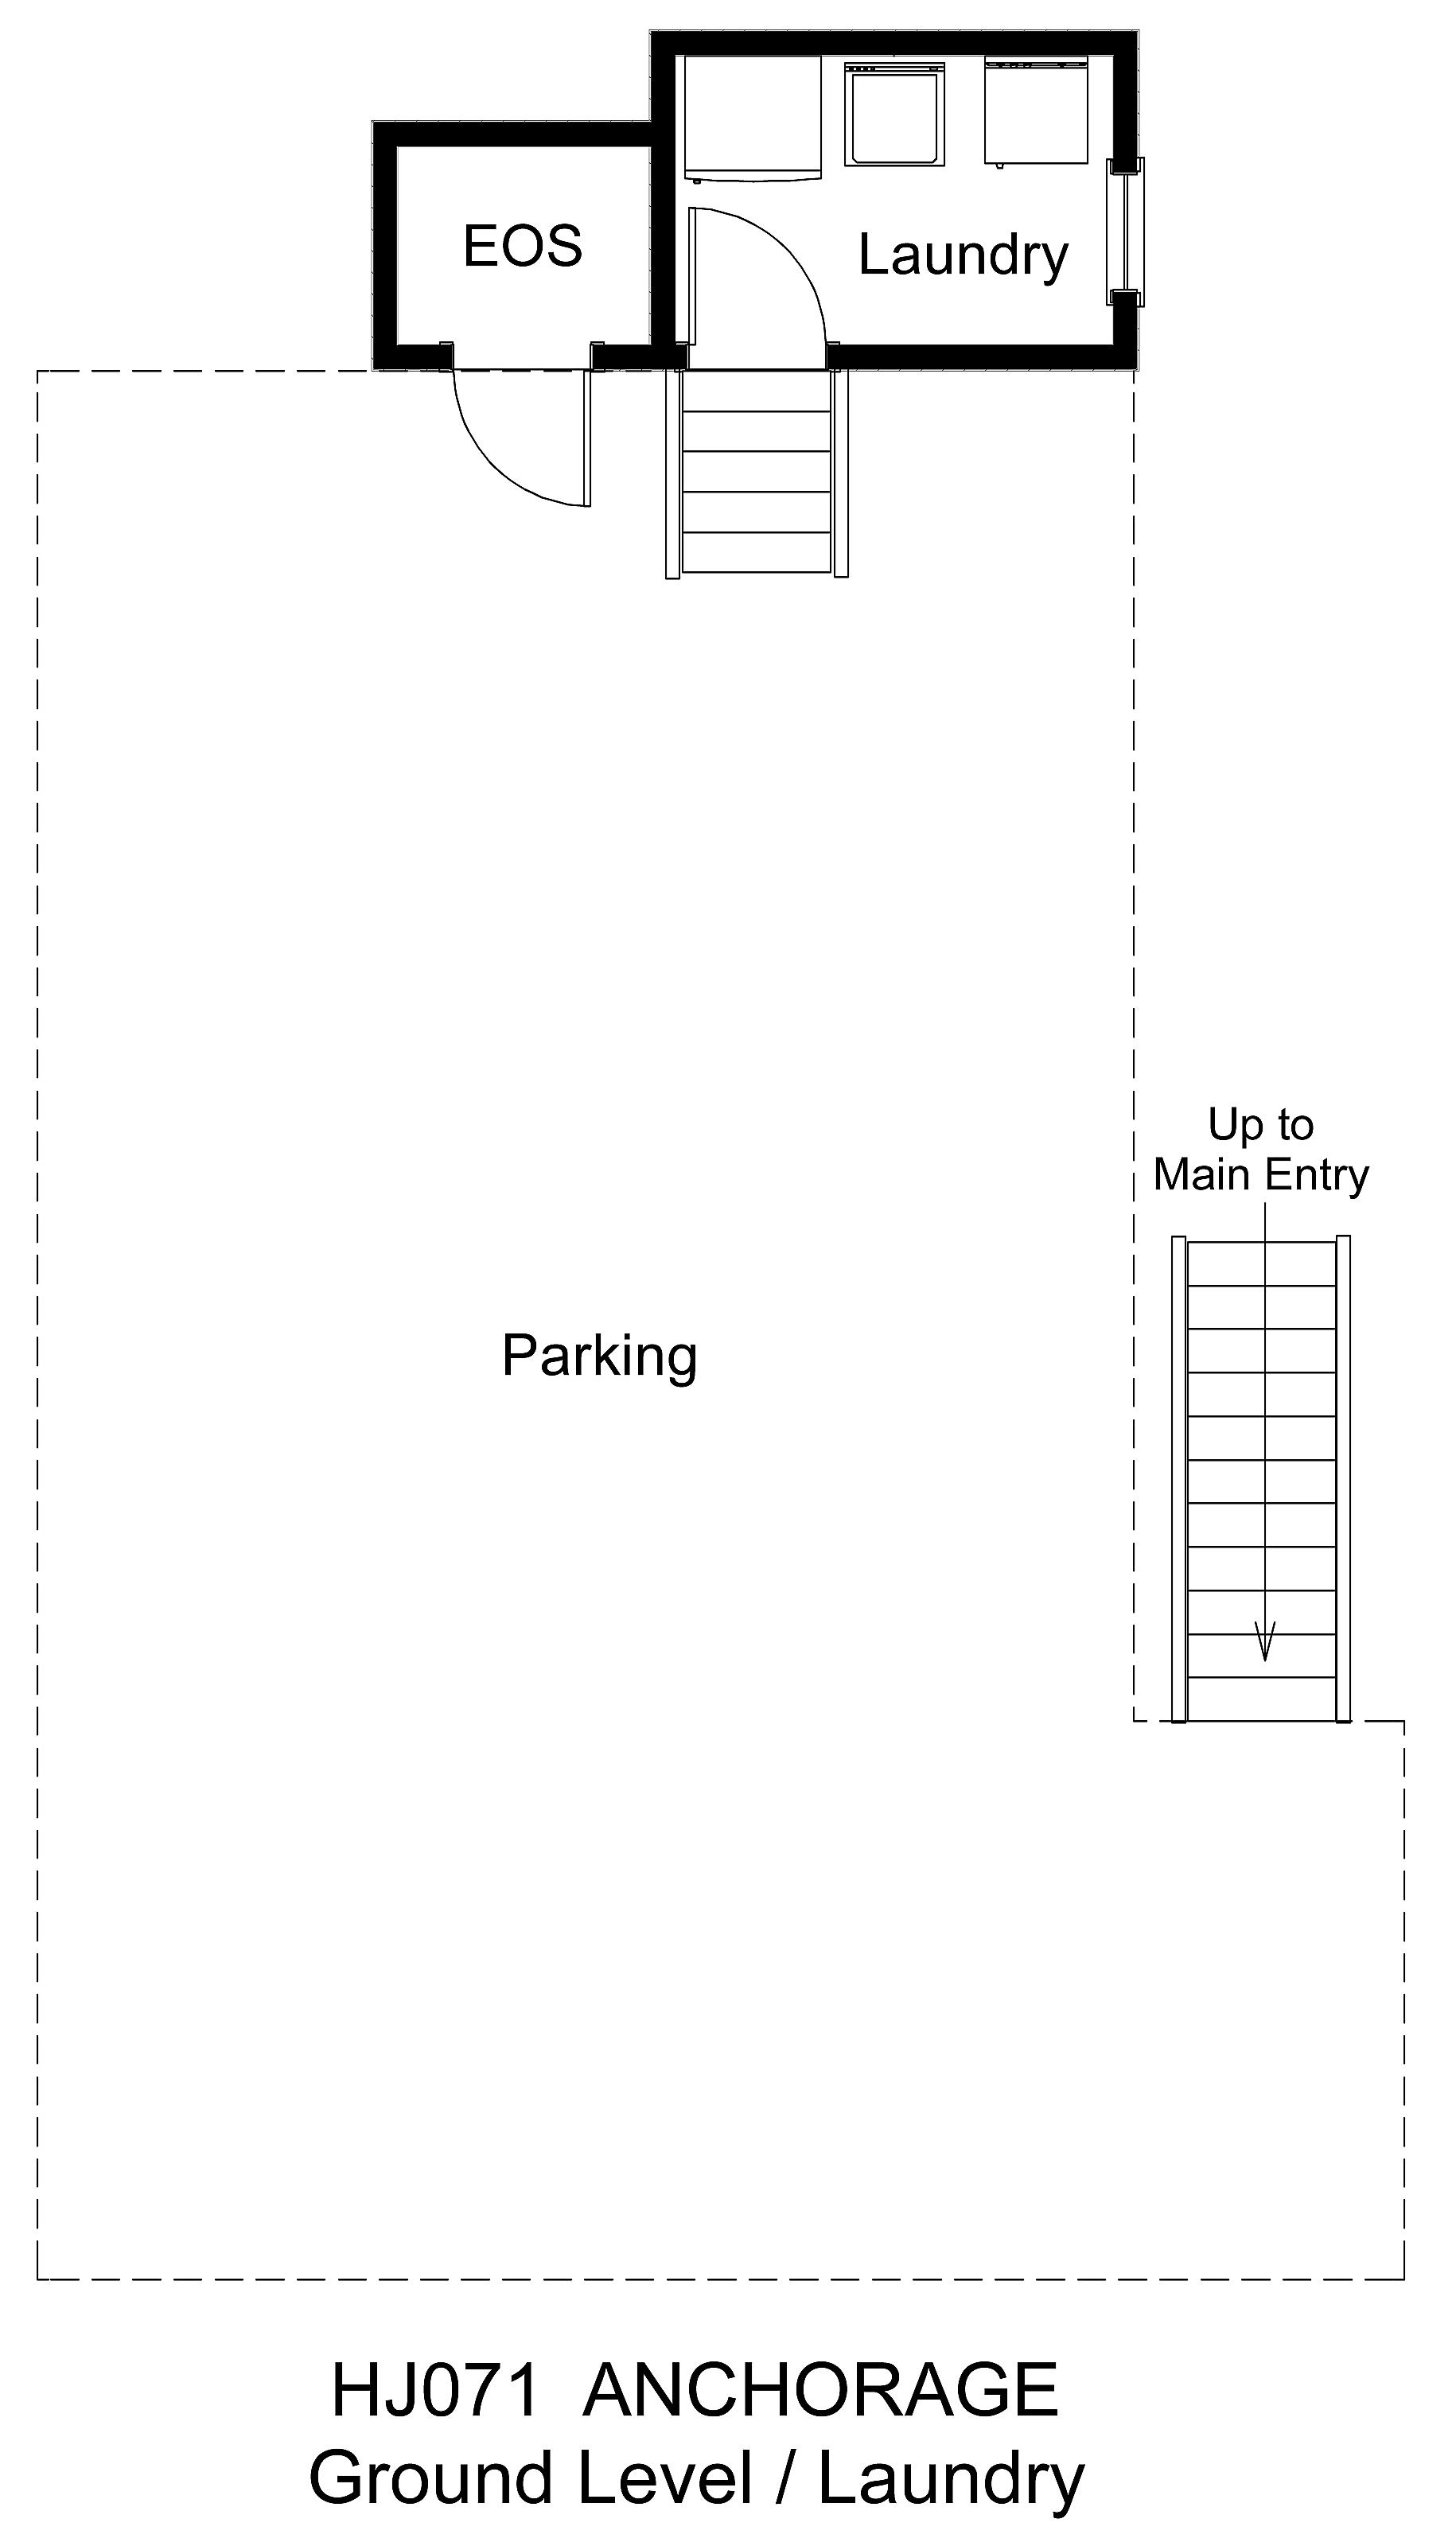 589c993b500e3 hj071 anchorage floor plans - ground level.jpg